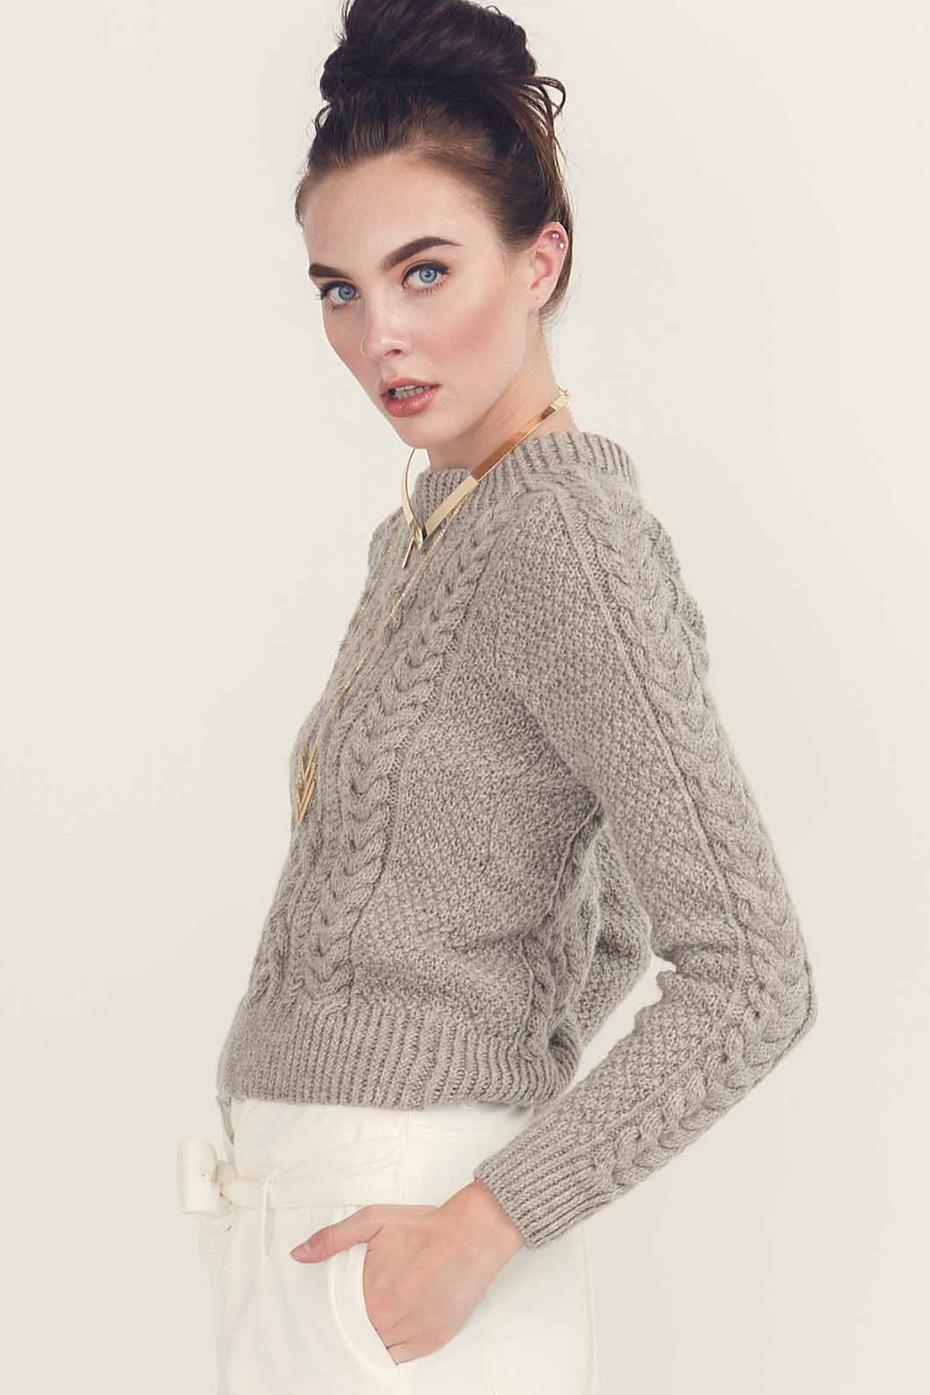 Eira Pullover by Linda Marveng